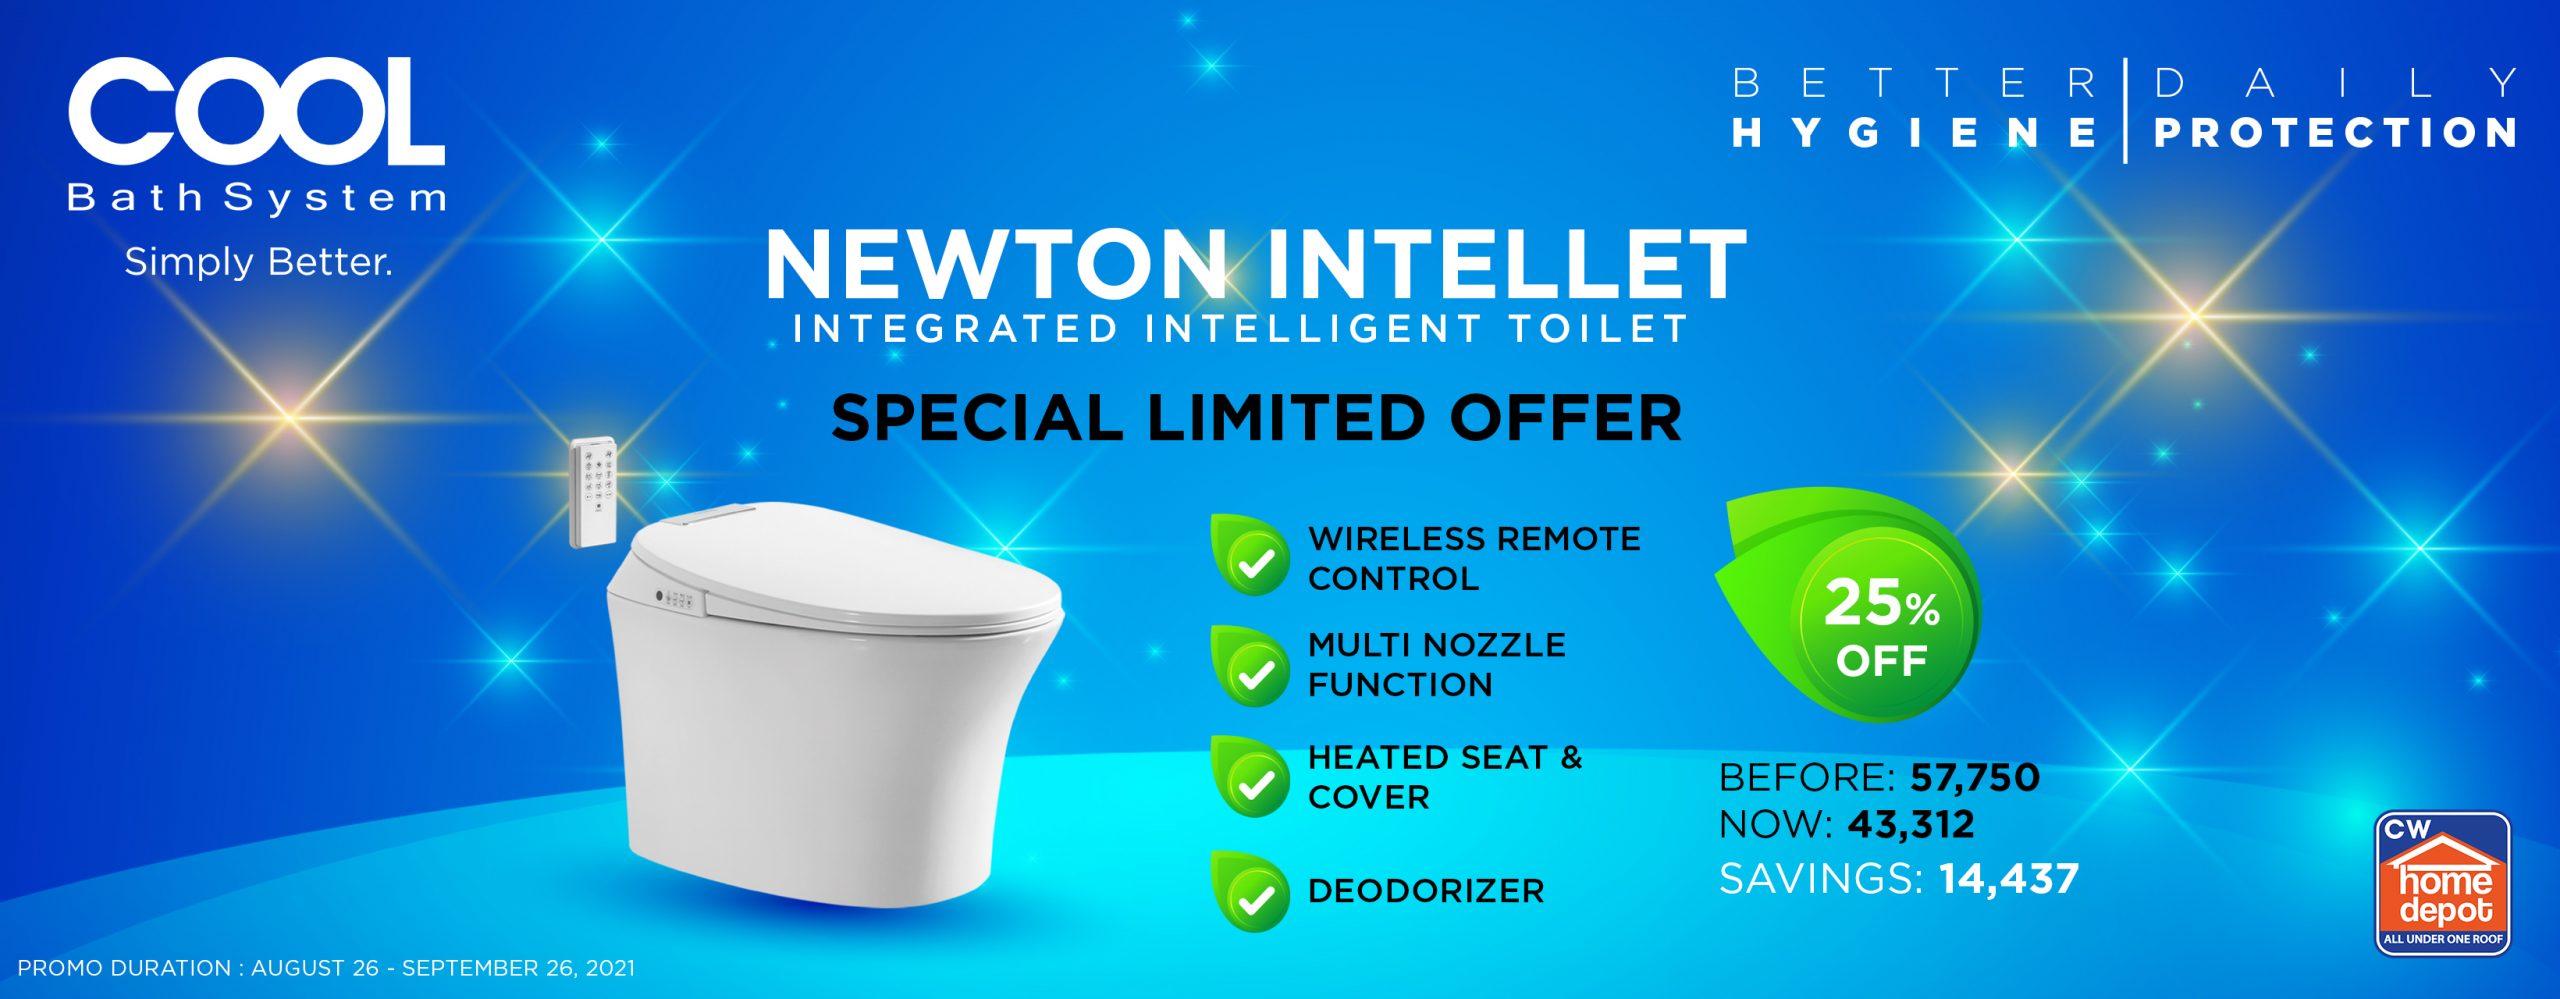 newton_web